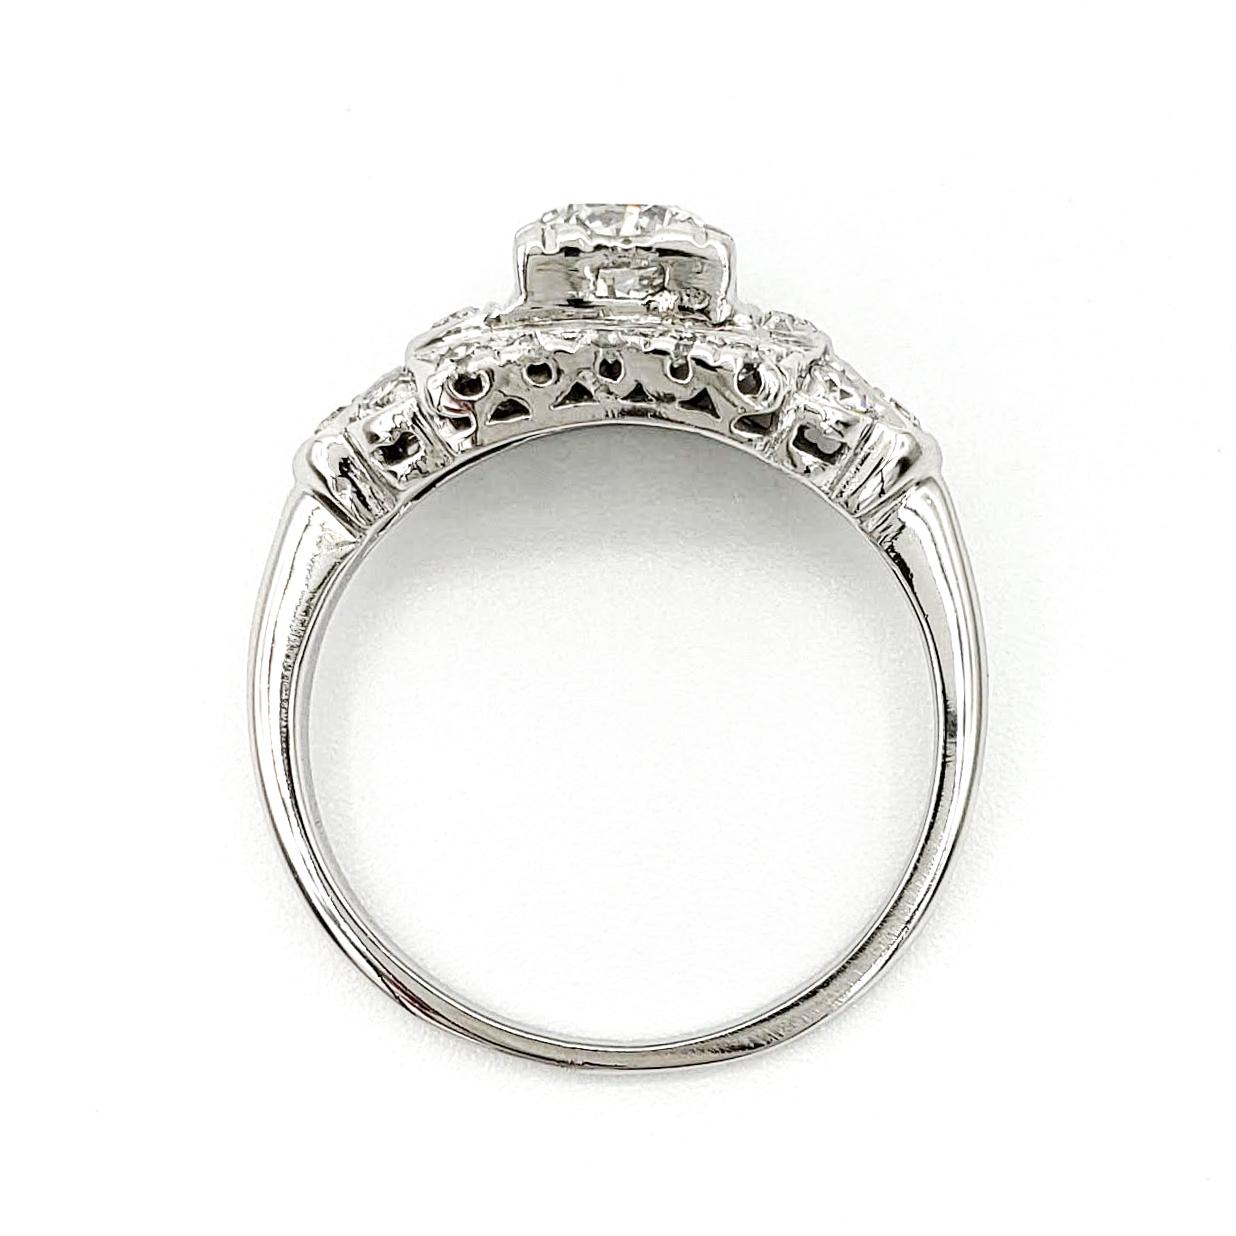 vintage-platinum-engagement-ring-with-0-55-carat-round-brilliant-cut-diamond-gia-g-si1